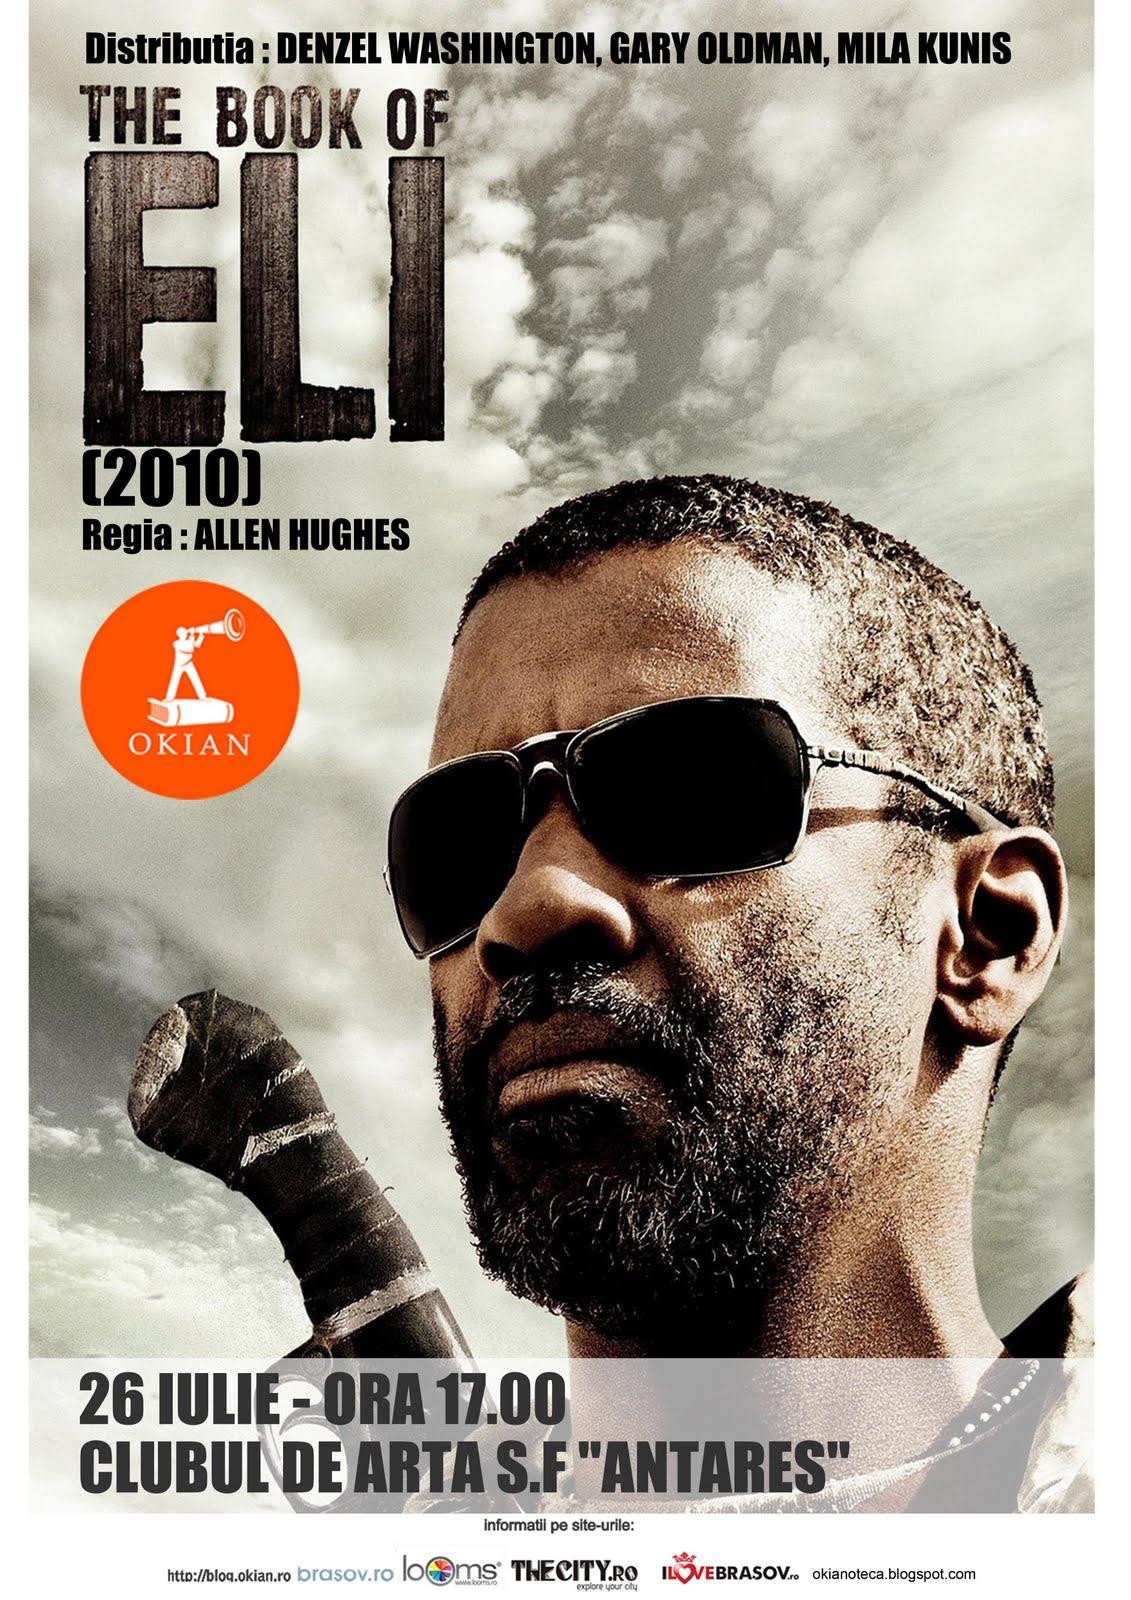 http://2.bp.blogspot.com/-gNd5BOkoTkc/Th_4QnMpXBI/AAAAAAAAAGc/6WxVSwkC7Xk/s1600/book+of+eli.jpg